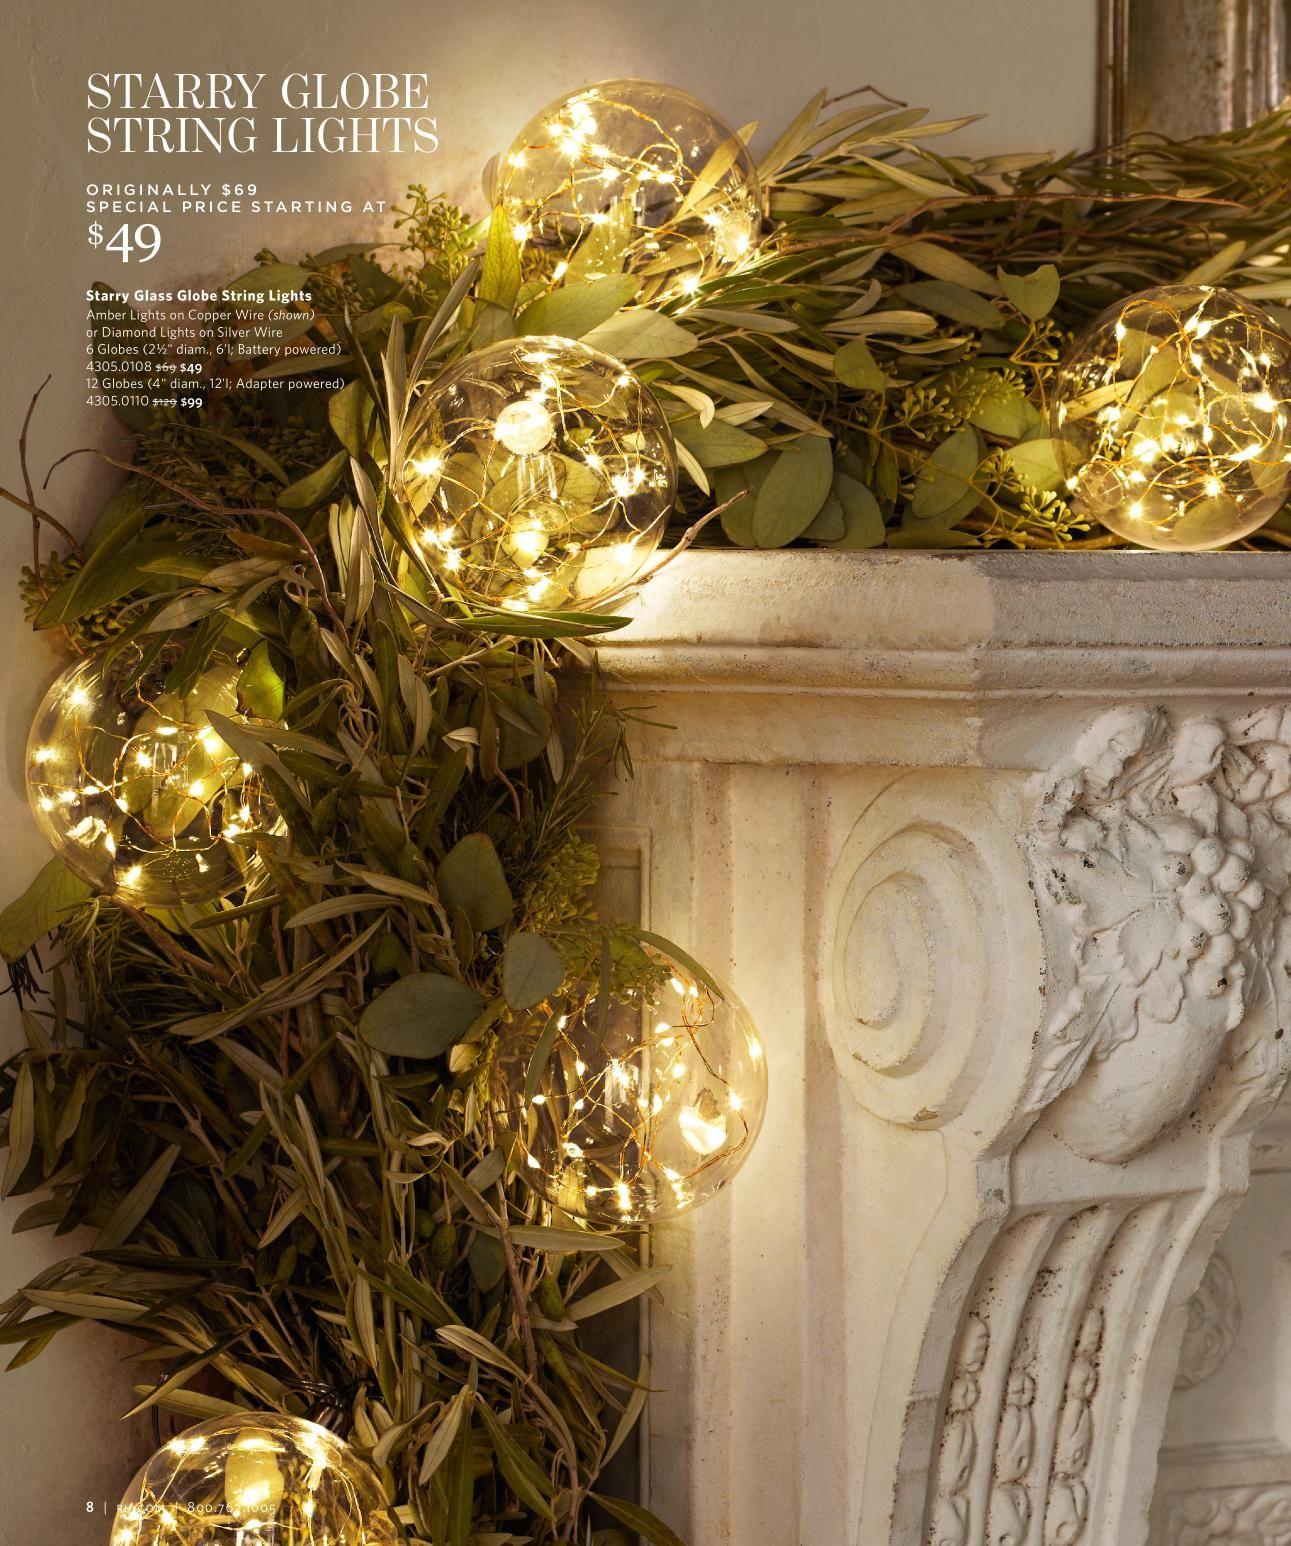 Stunning Globe Lights Restoration Hardware Christmas